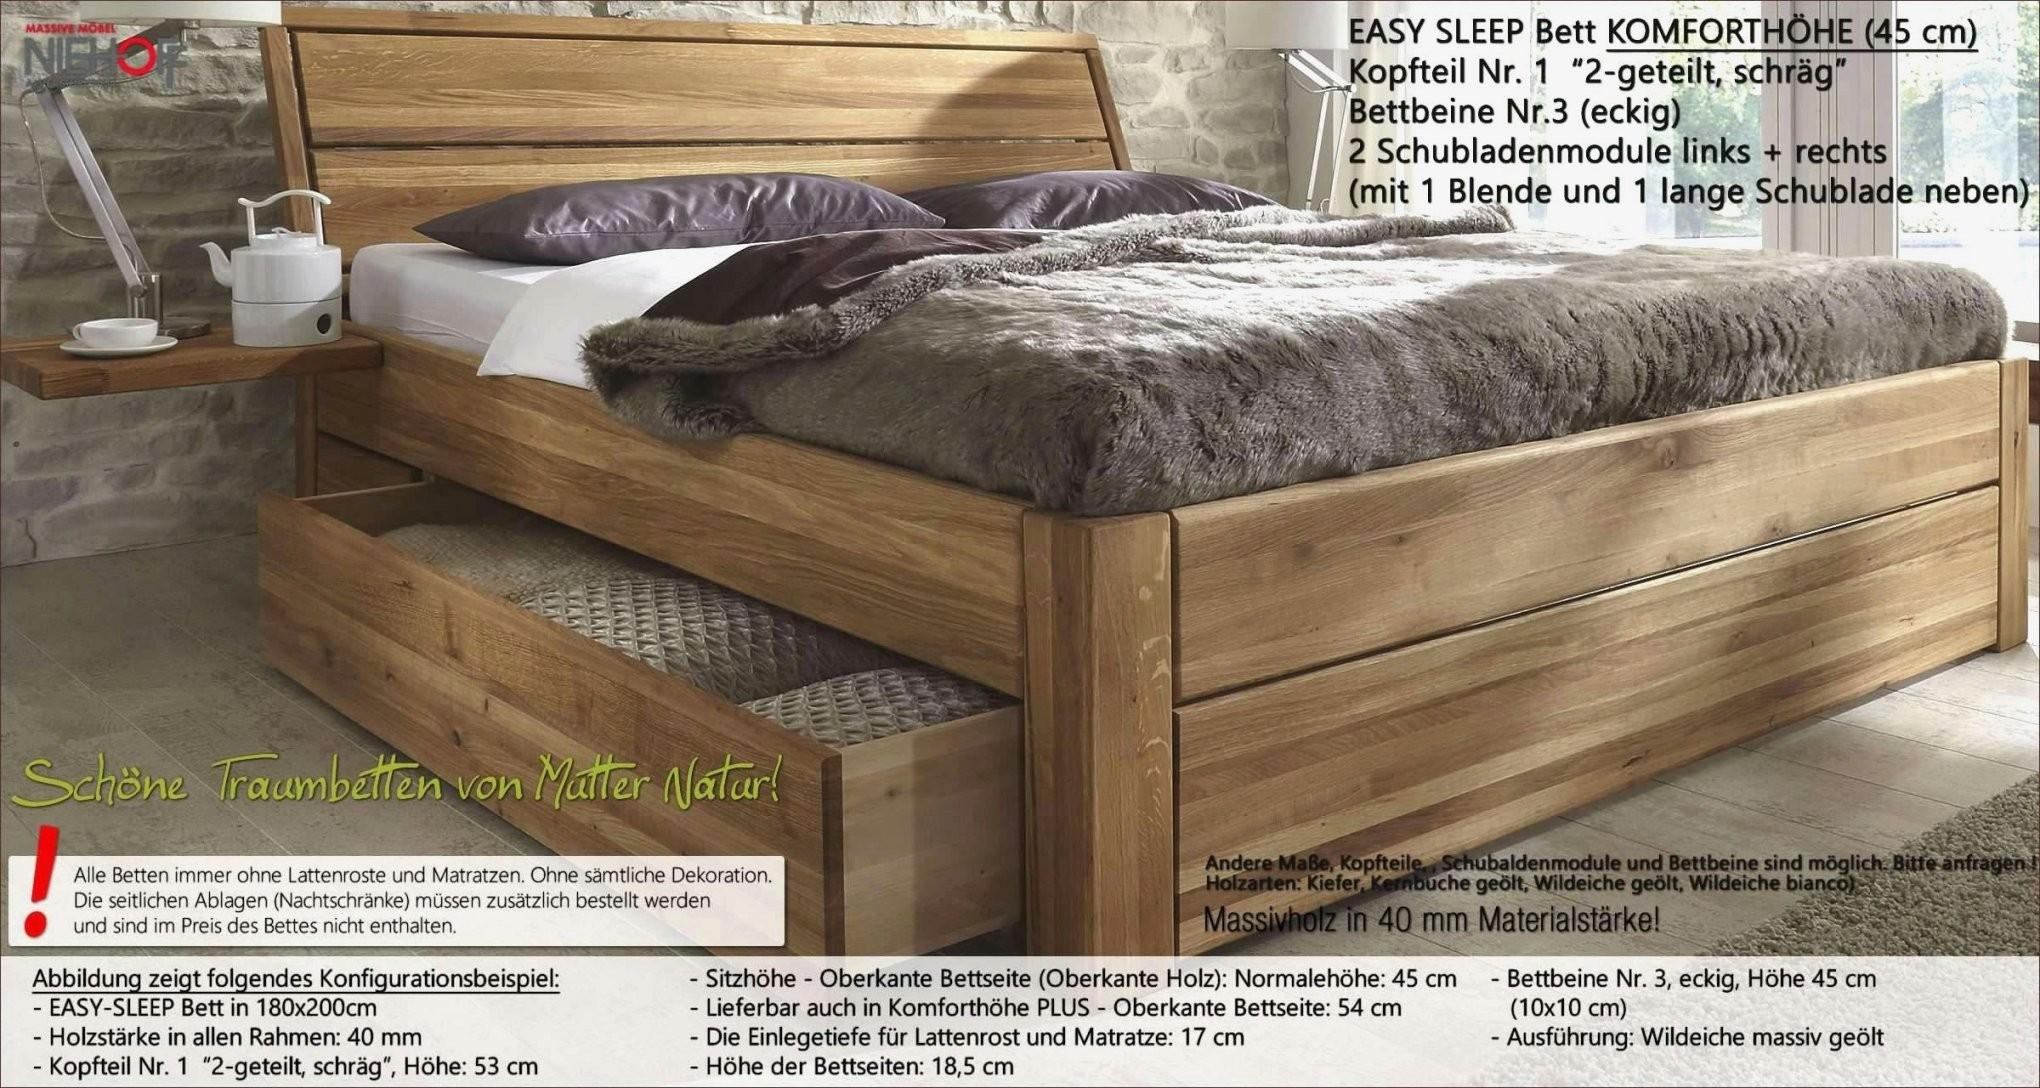 Ikea Lattenrost 140X200 Malm Einmalig Inspirierend Bett 140X200 Mit von Bettgestell Mit Lattenrost 140X200 Bild